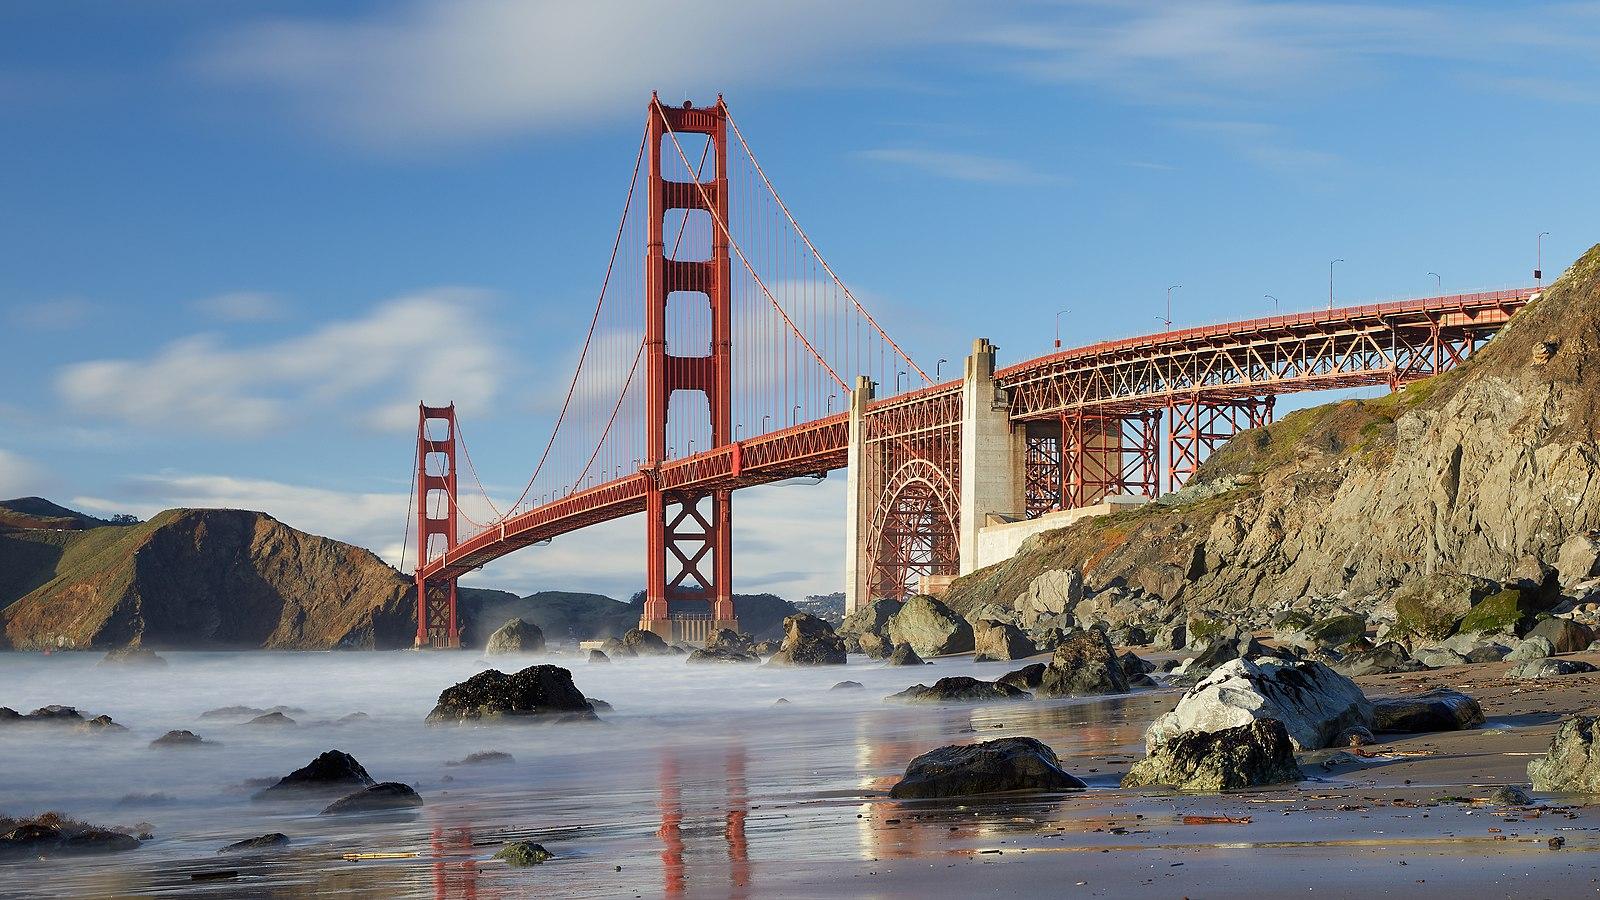 Golden Gate Bridge as seen from Marshall's Beach